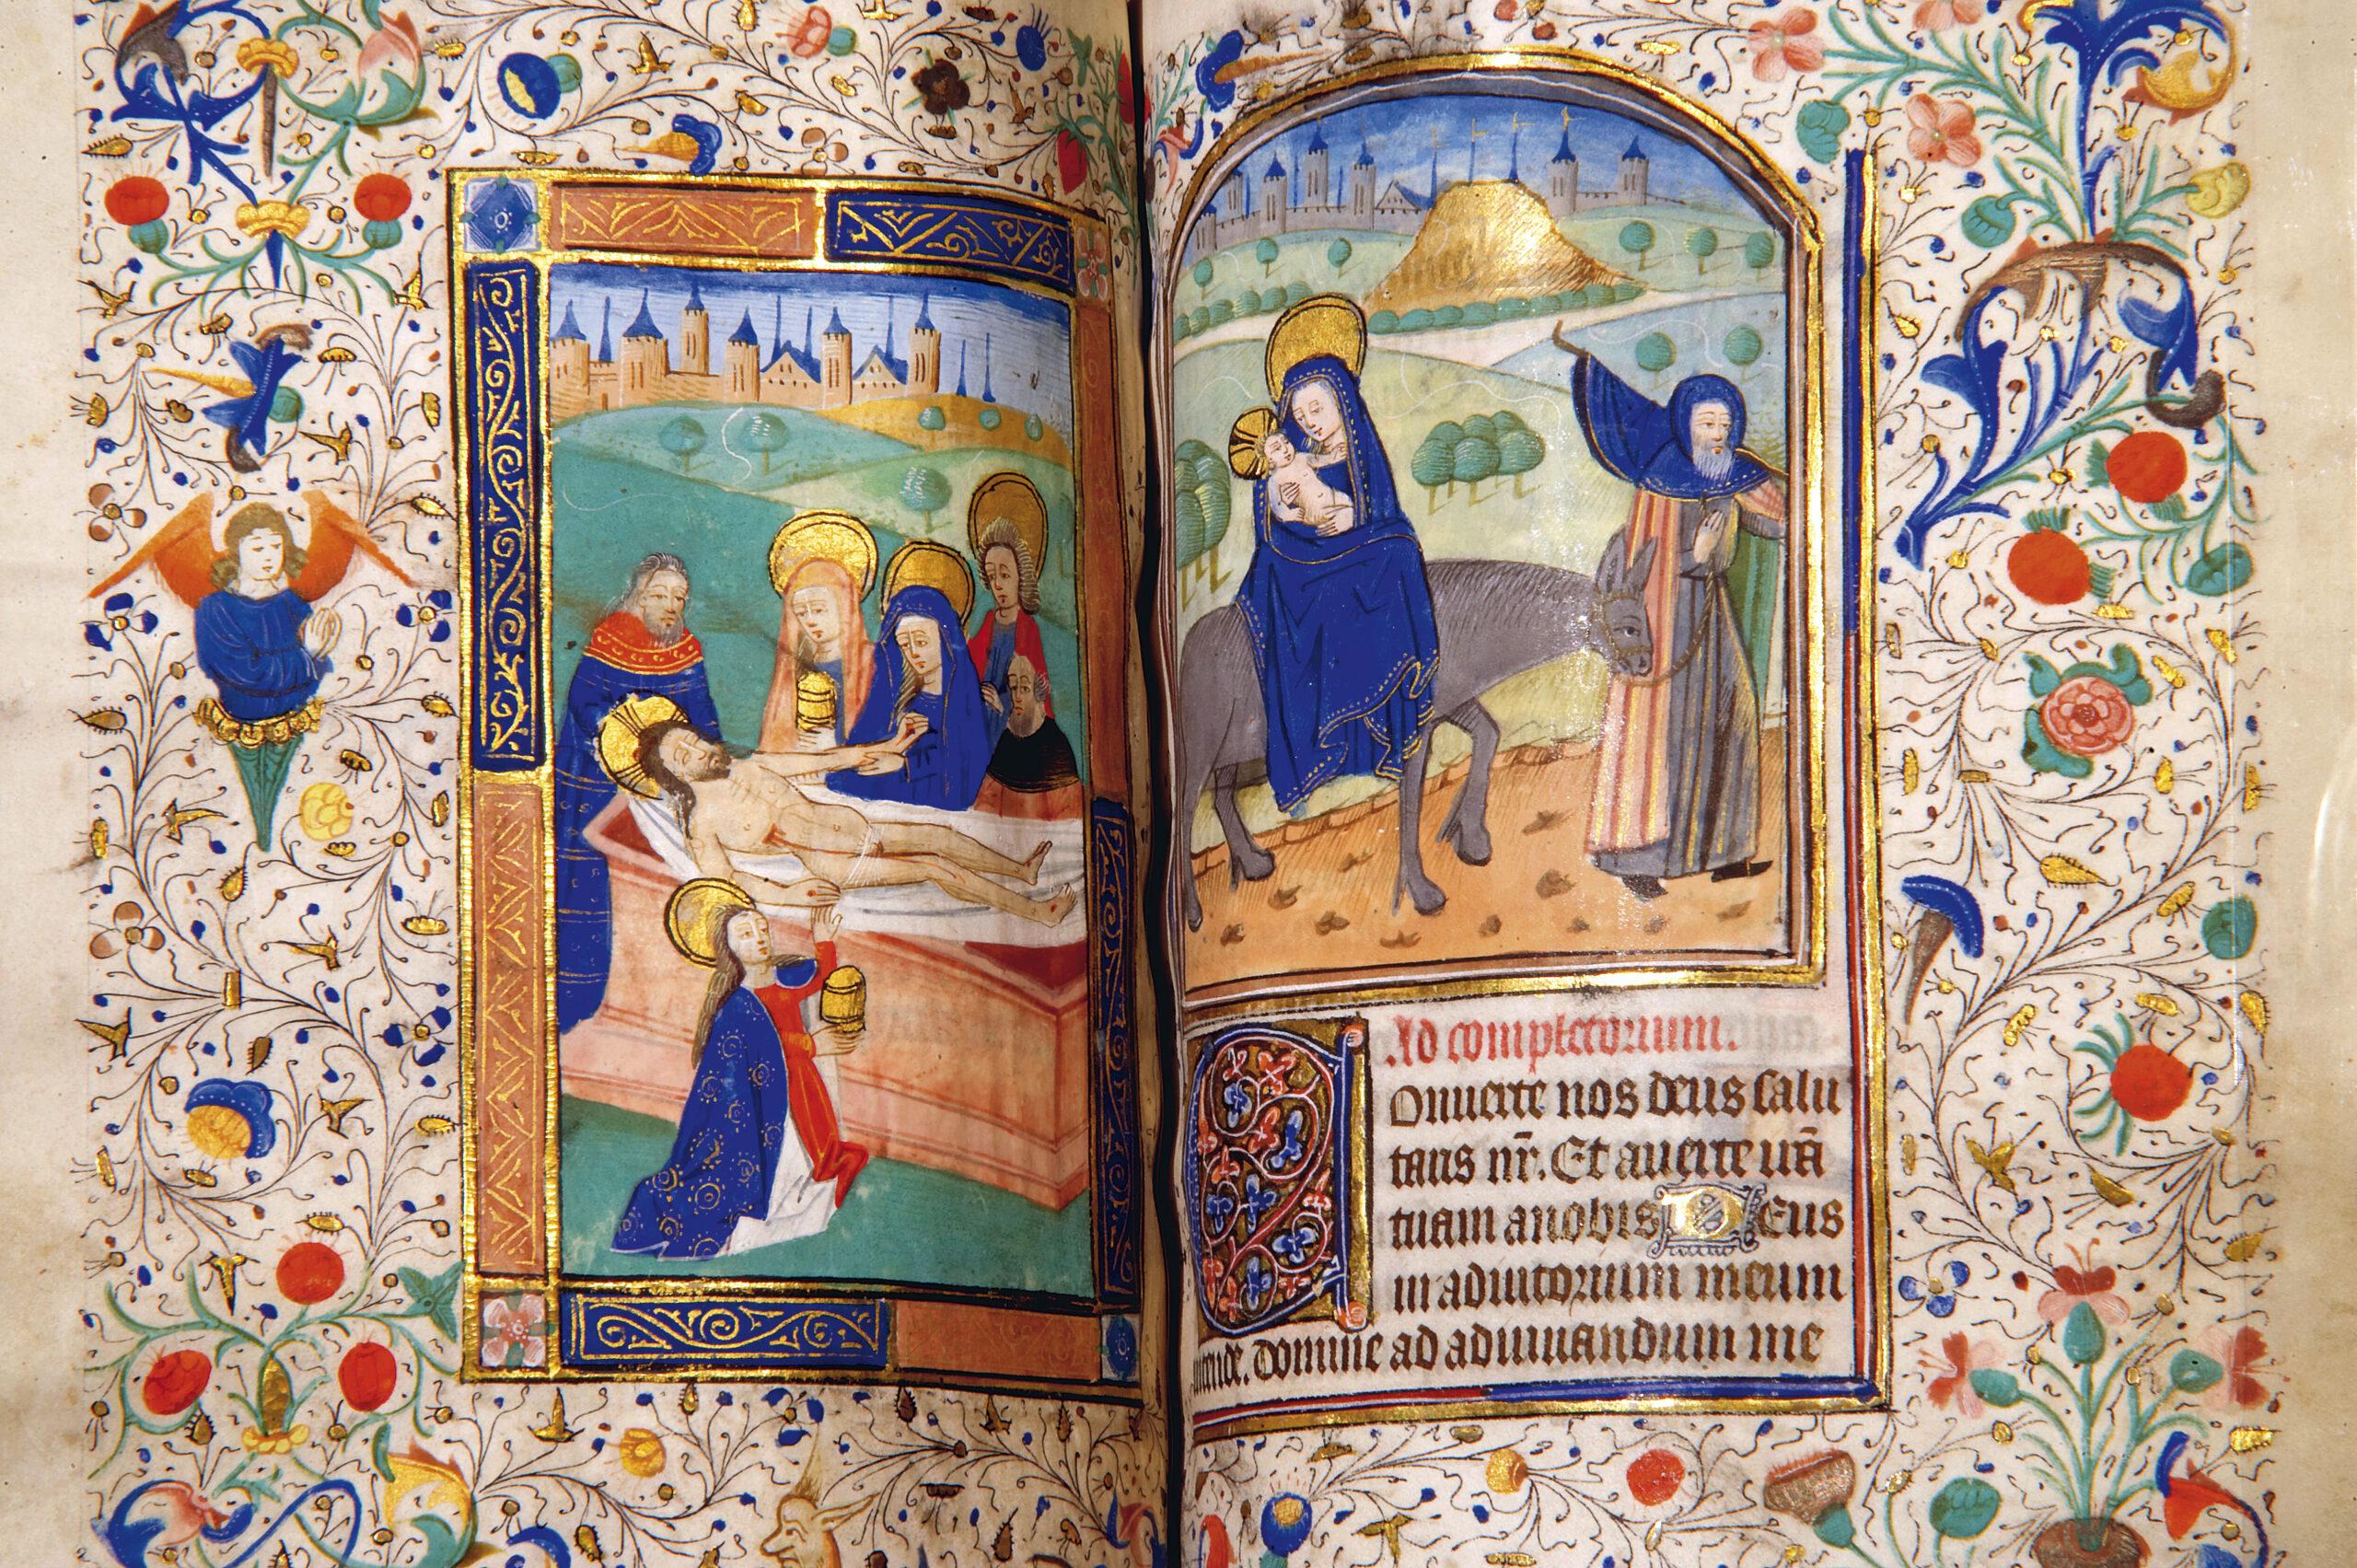 Hidden inscriptions discovered in Anne Boleyn's prayerbook